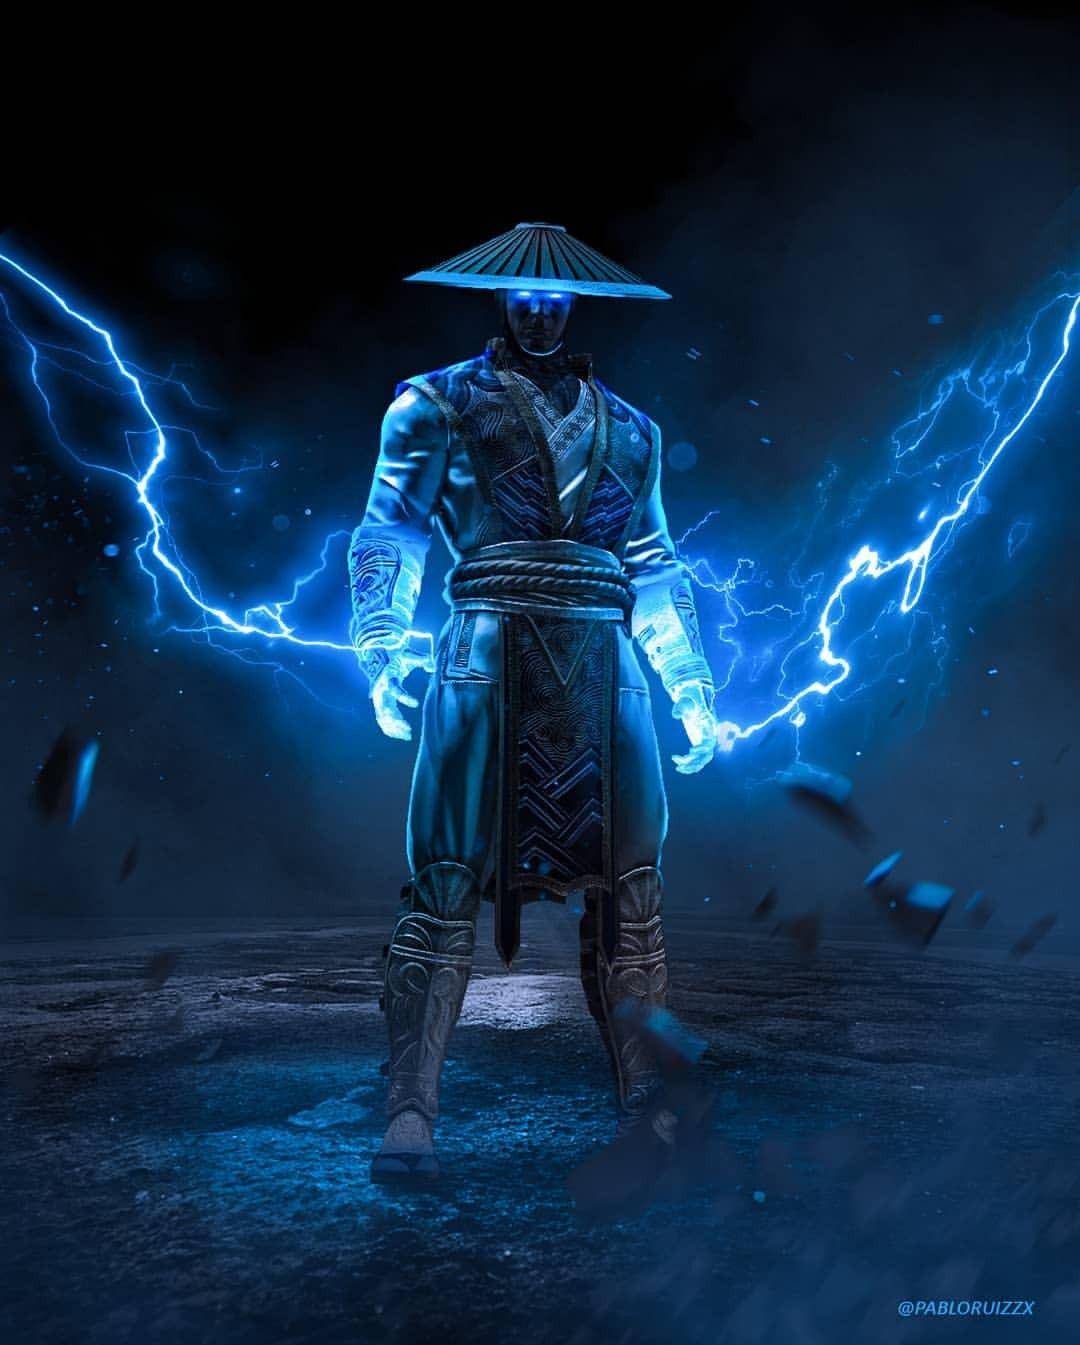 Raiden Fan Art Raiden Mortal Kombat Mortal Kombat Art Scorpion Mortal Kombat